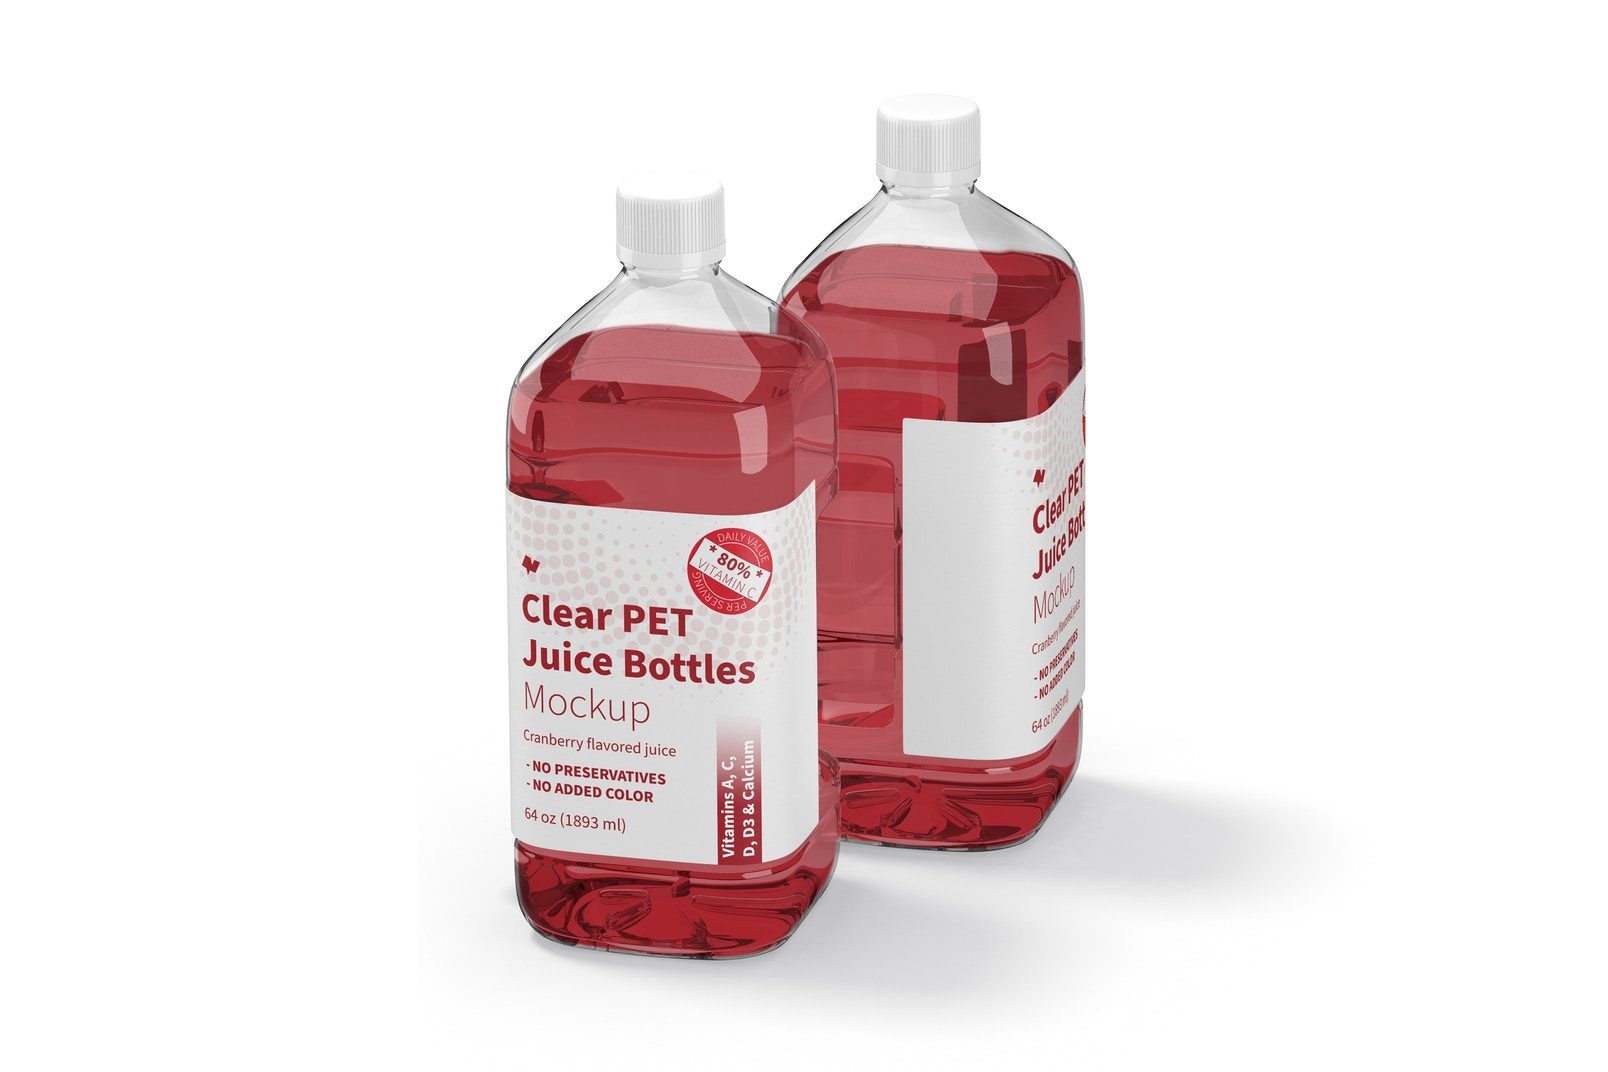 64 oz Clear PET Juice Bottles Mockup, Perspective View